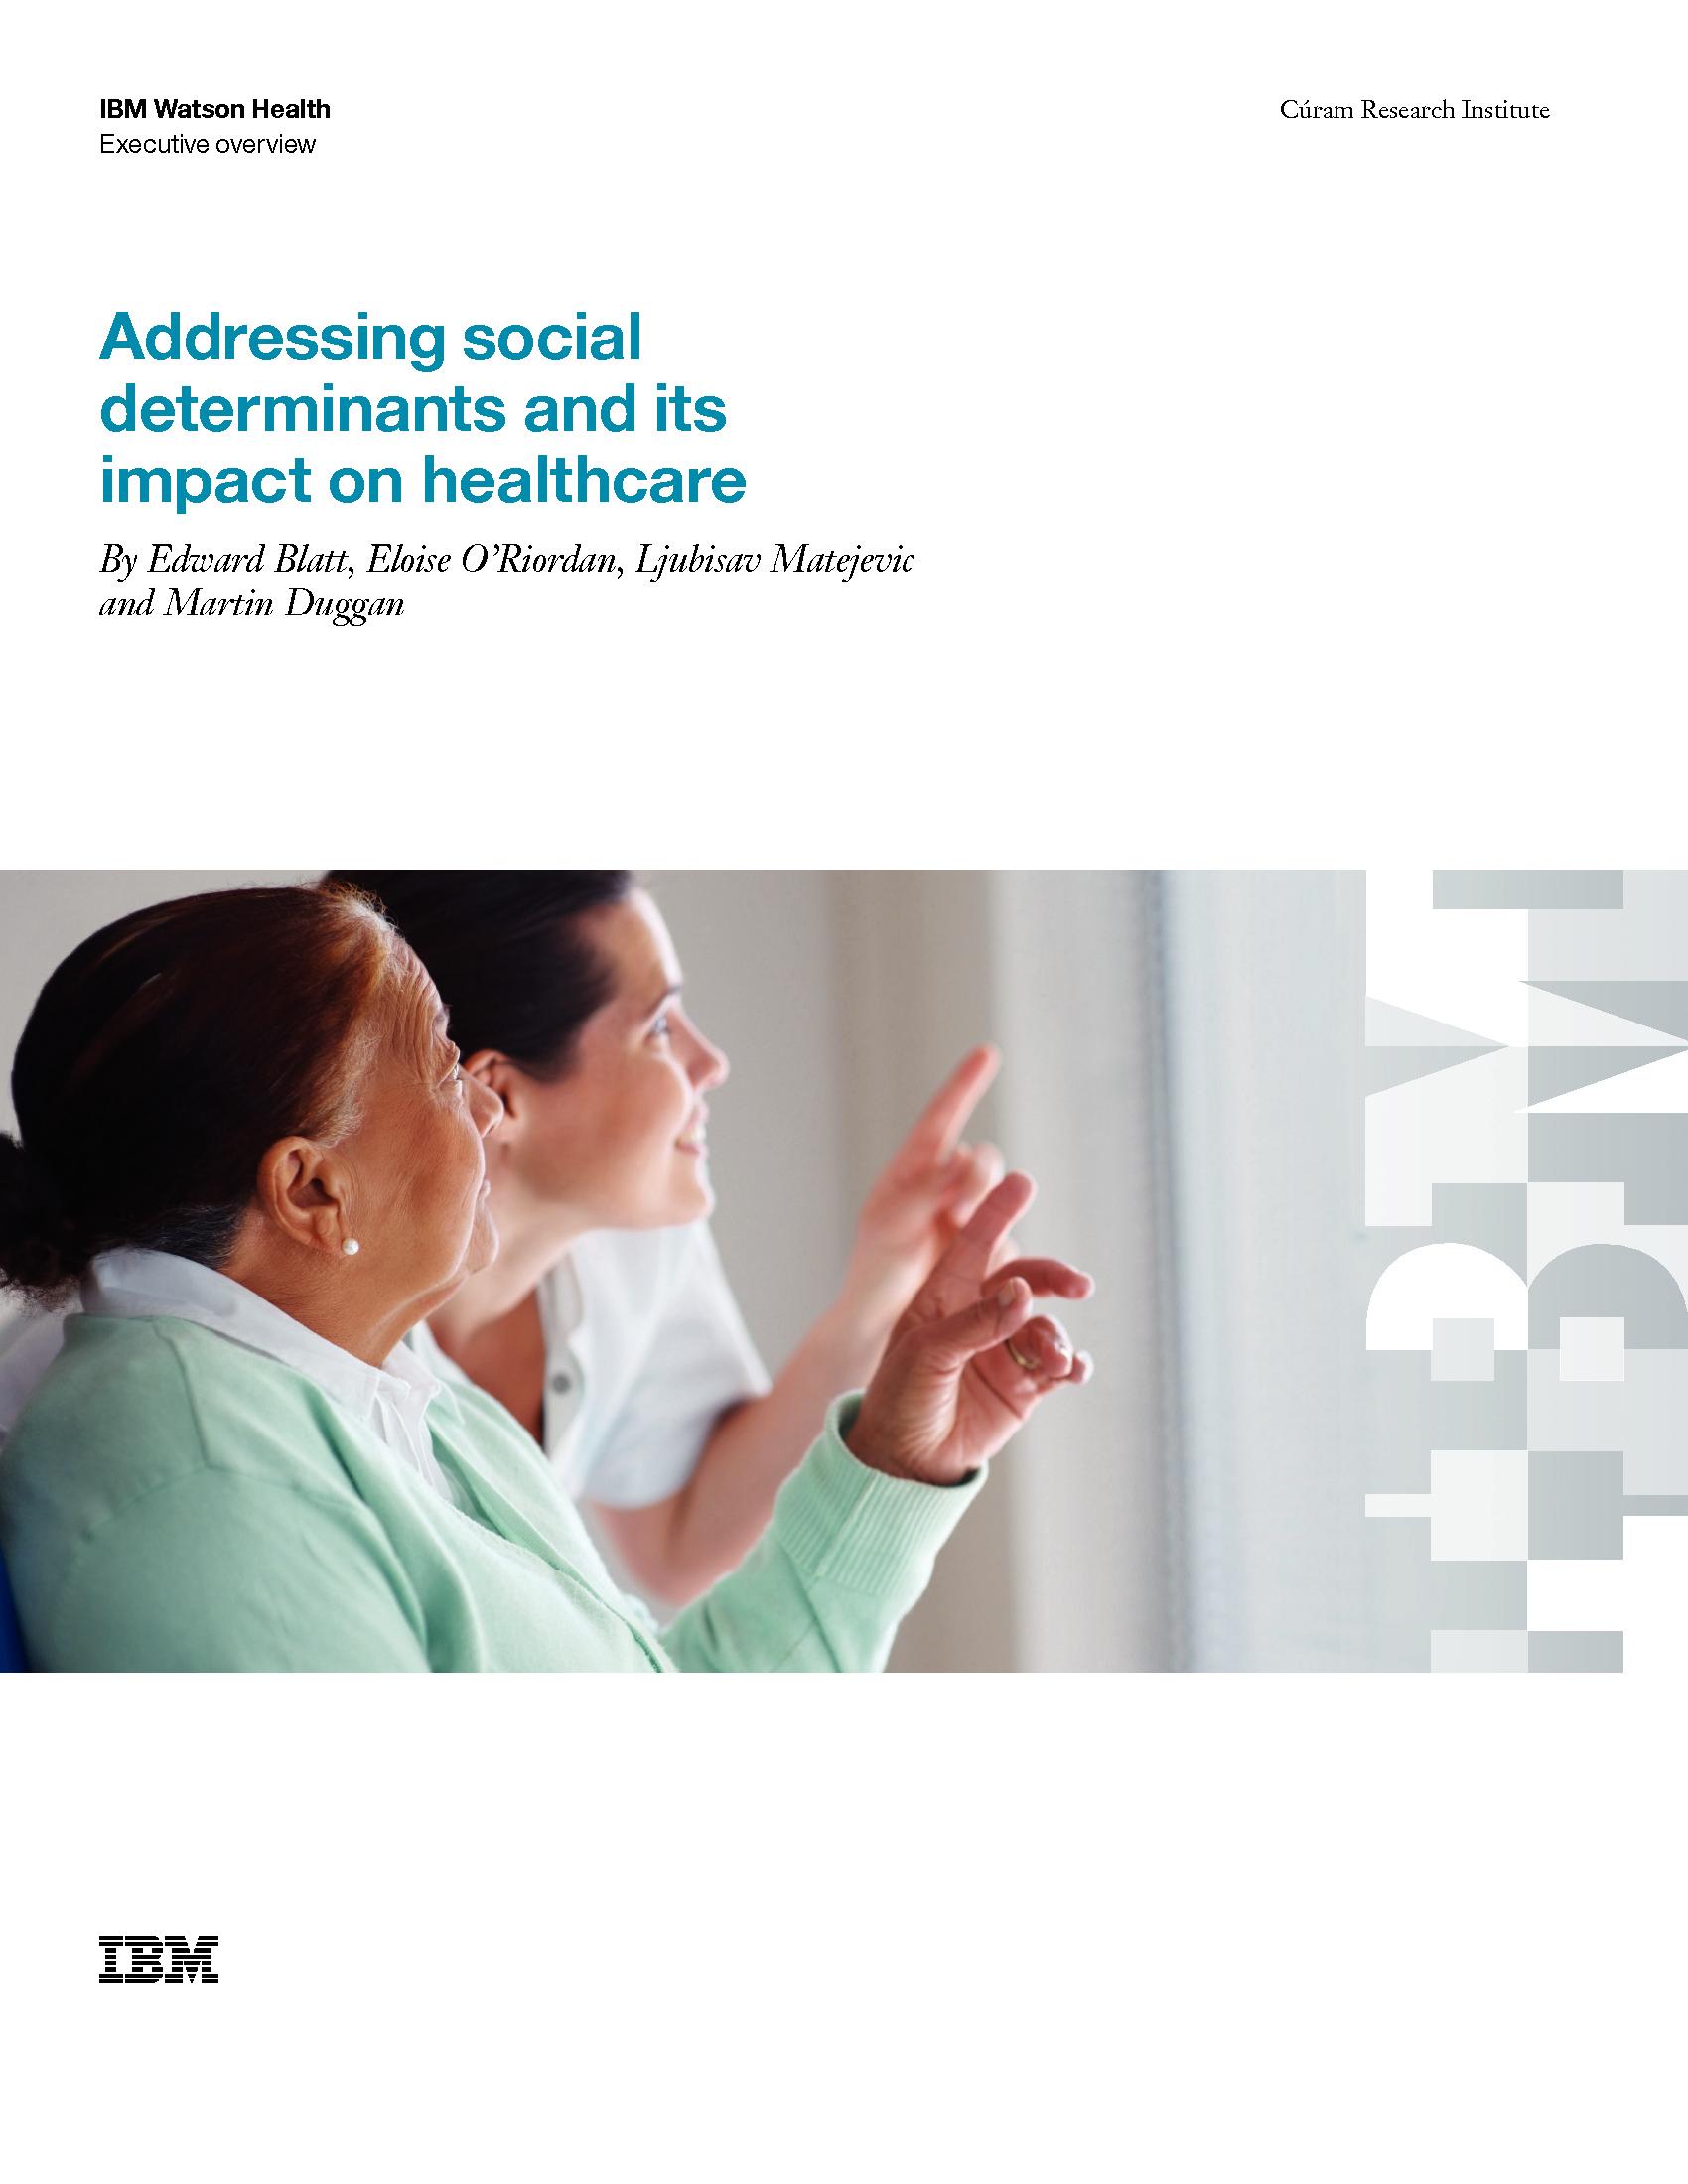 GOV - IBM - Smarter Microsite 2019 - Addressing social determinants